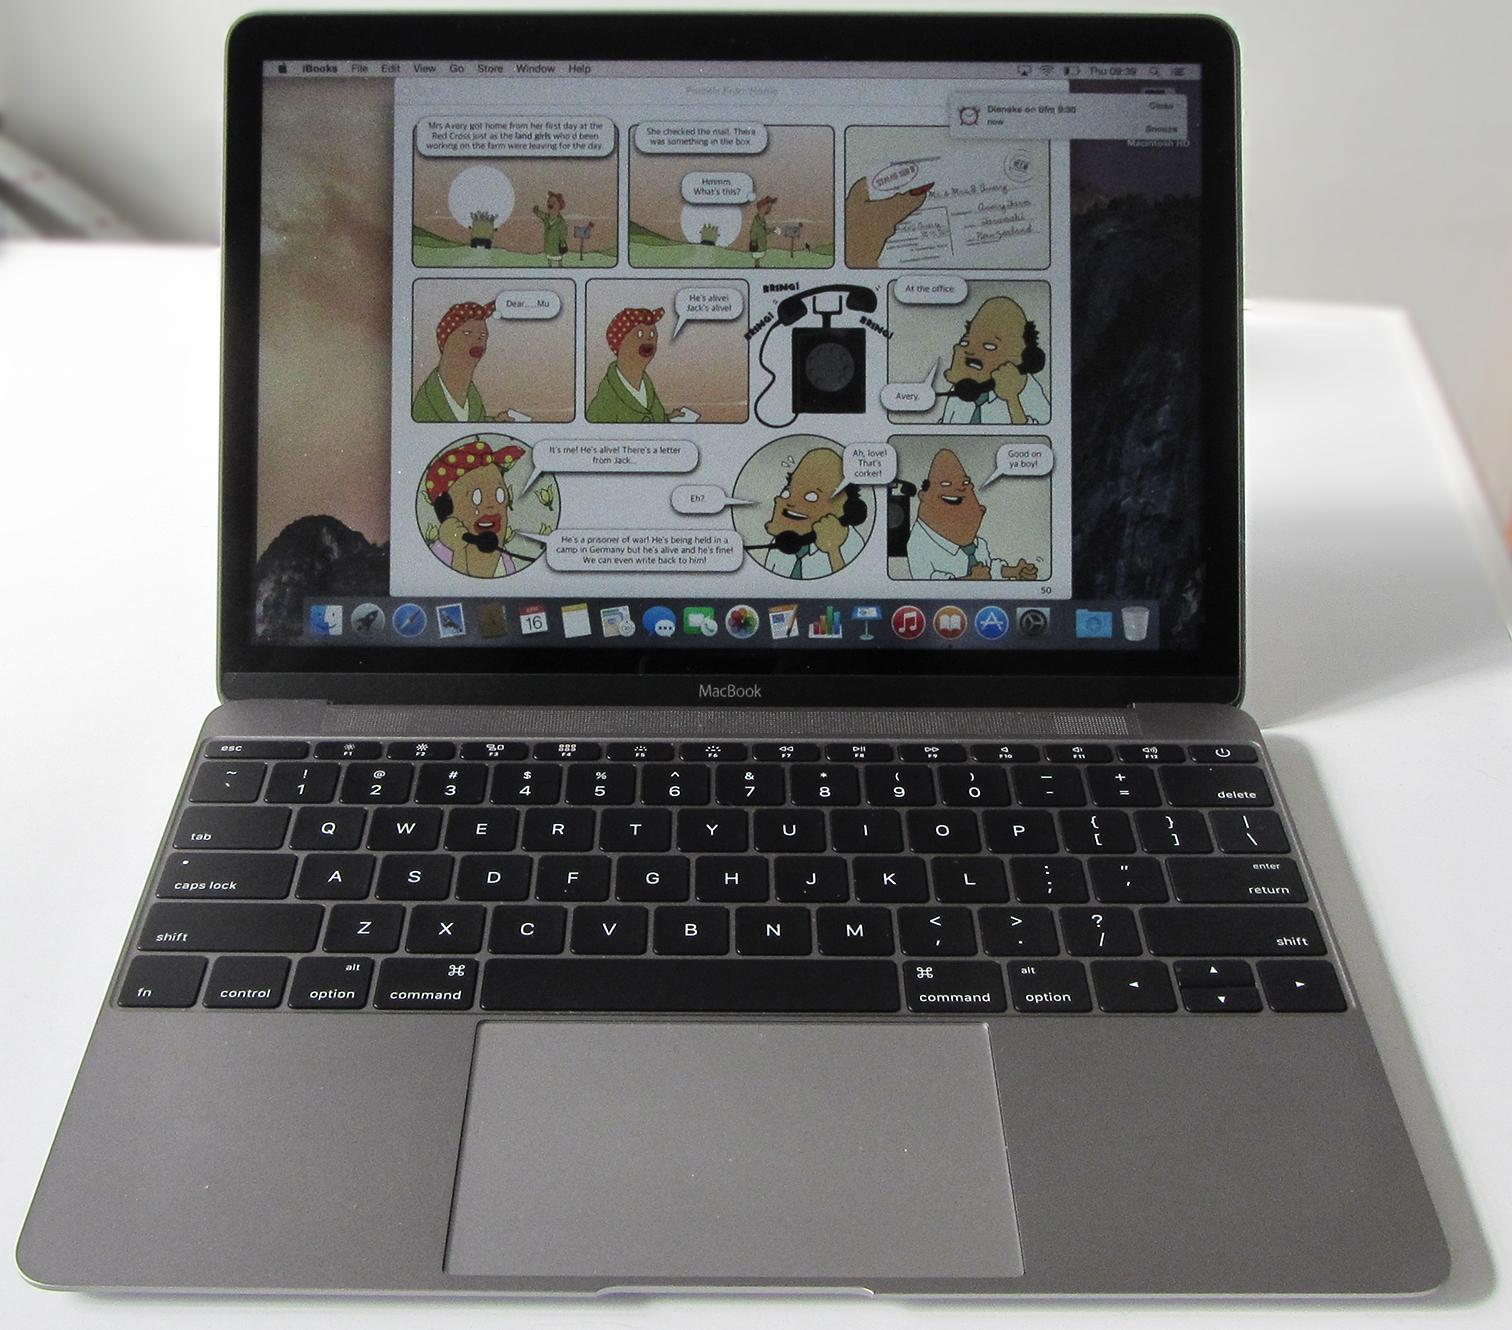 macbook keystrokes